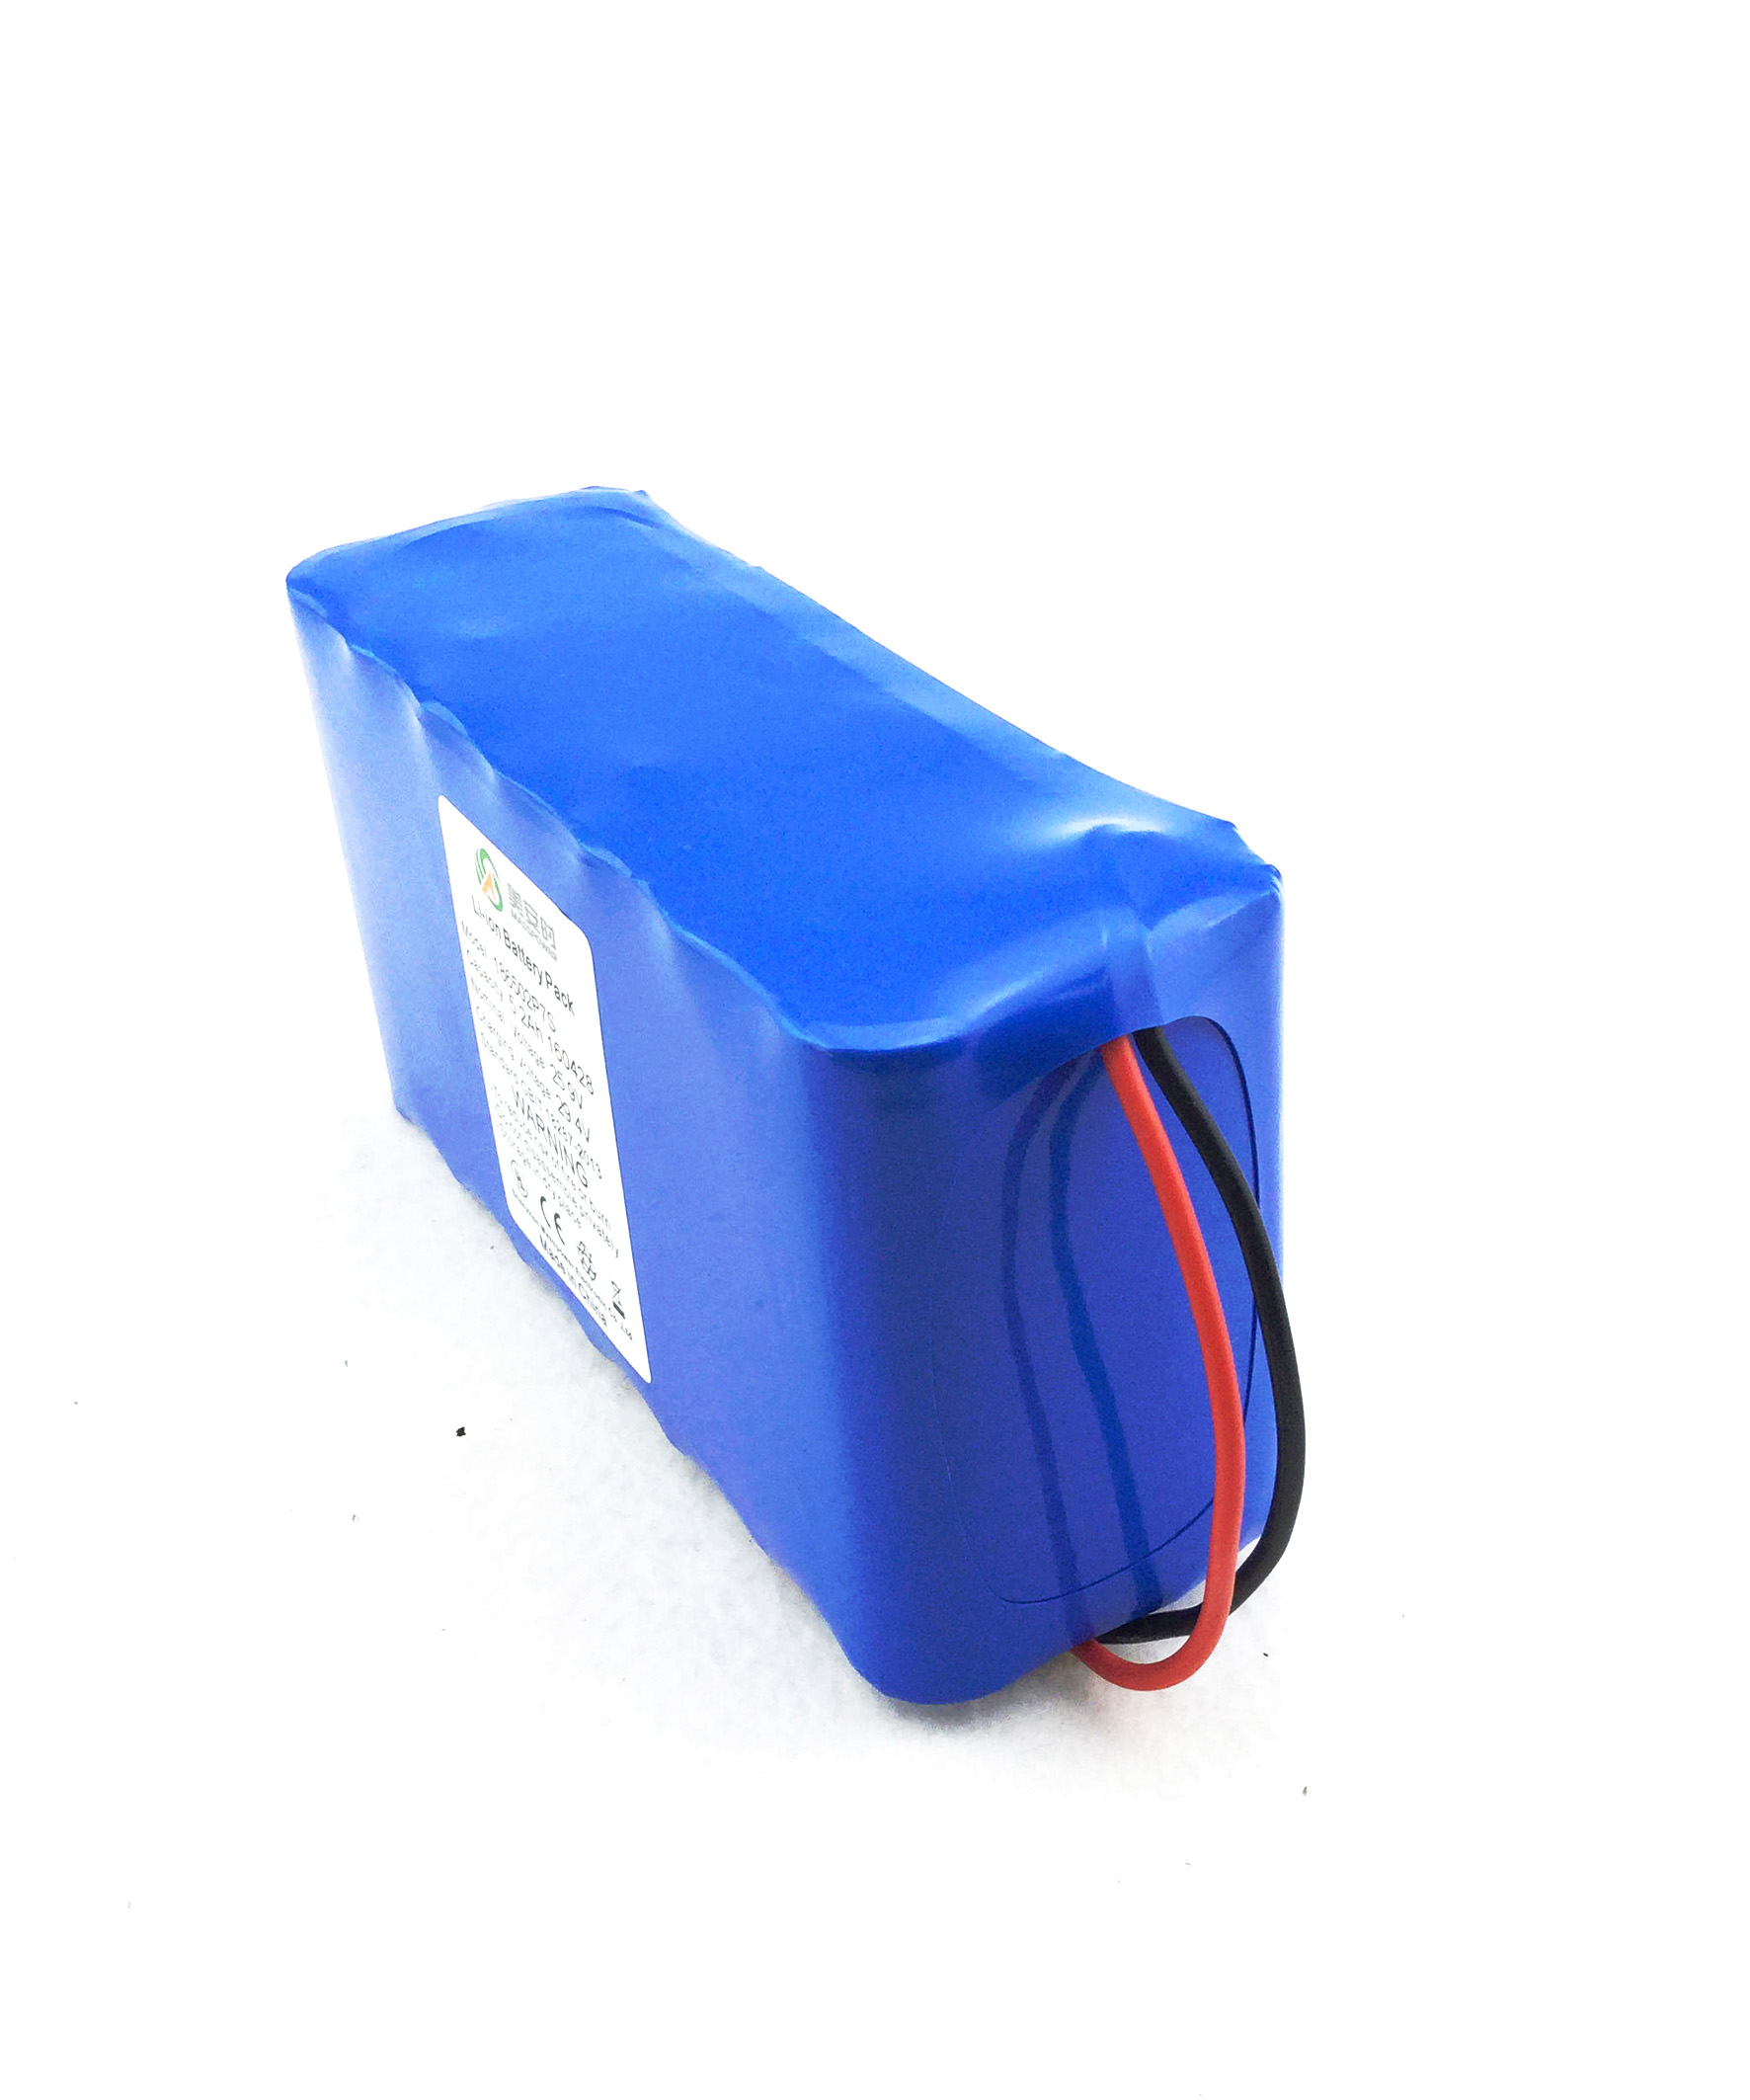 25.9V 5.2Ah丨家用呼吸机锂电池